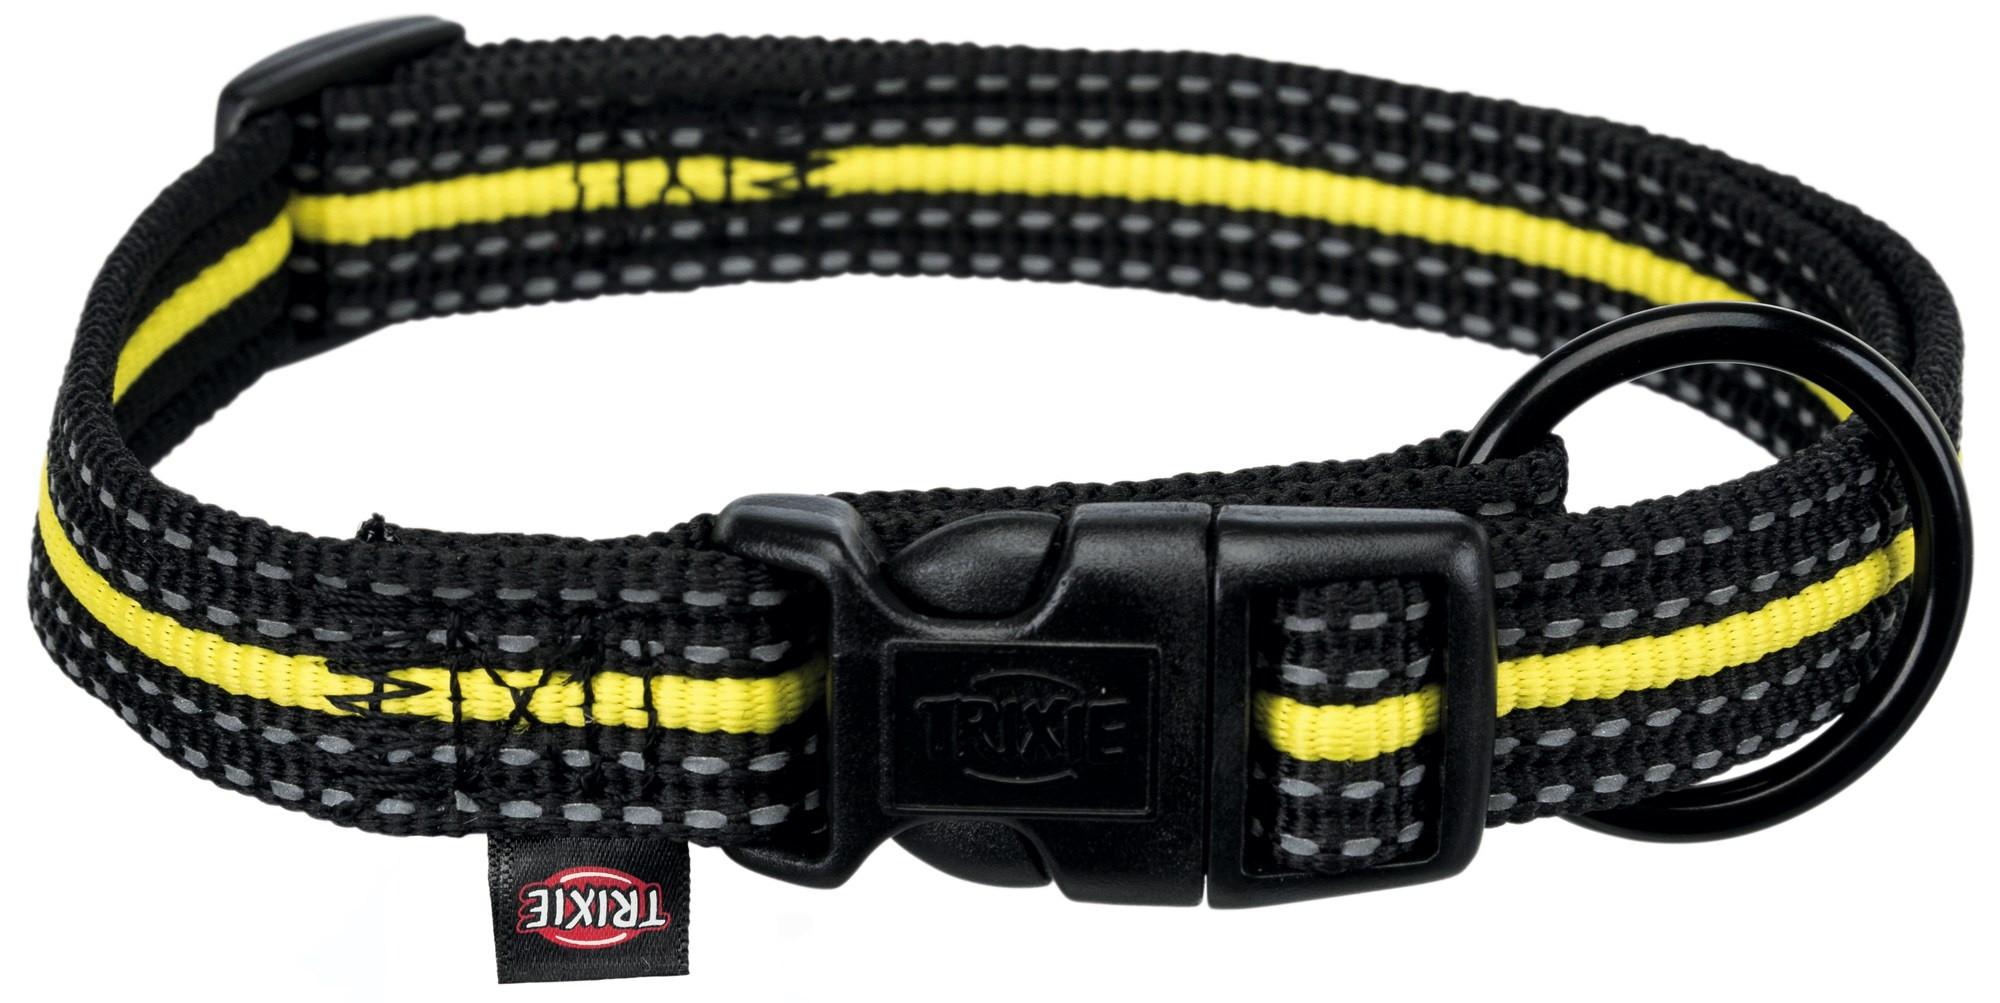 Ошейник для собак TRIXIE Fusion Sporting, черно-желтый, S–M, 30–45см, 17мм